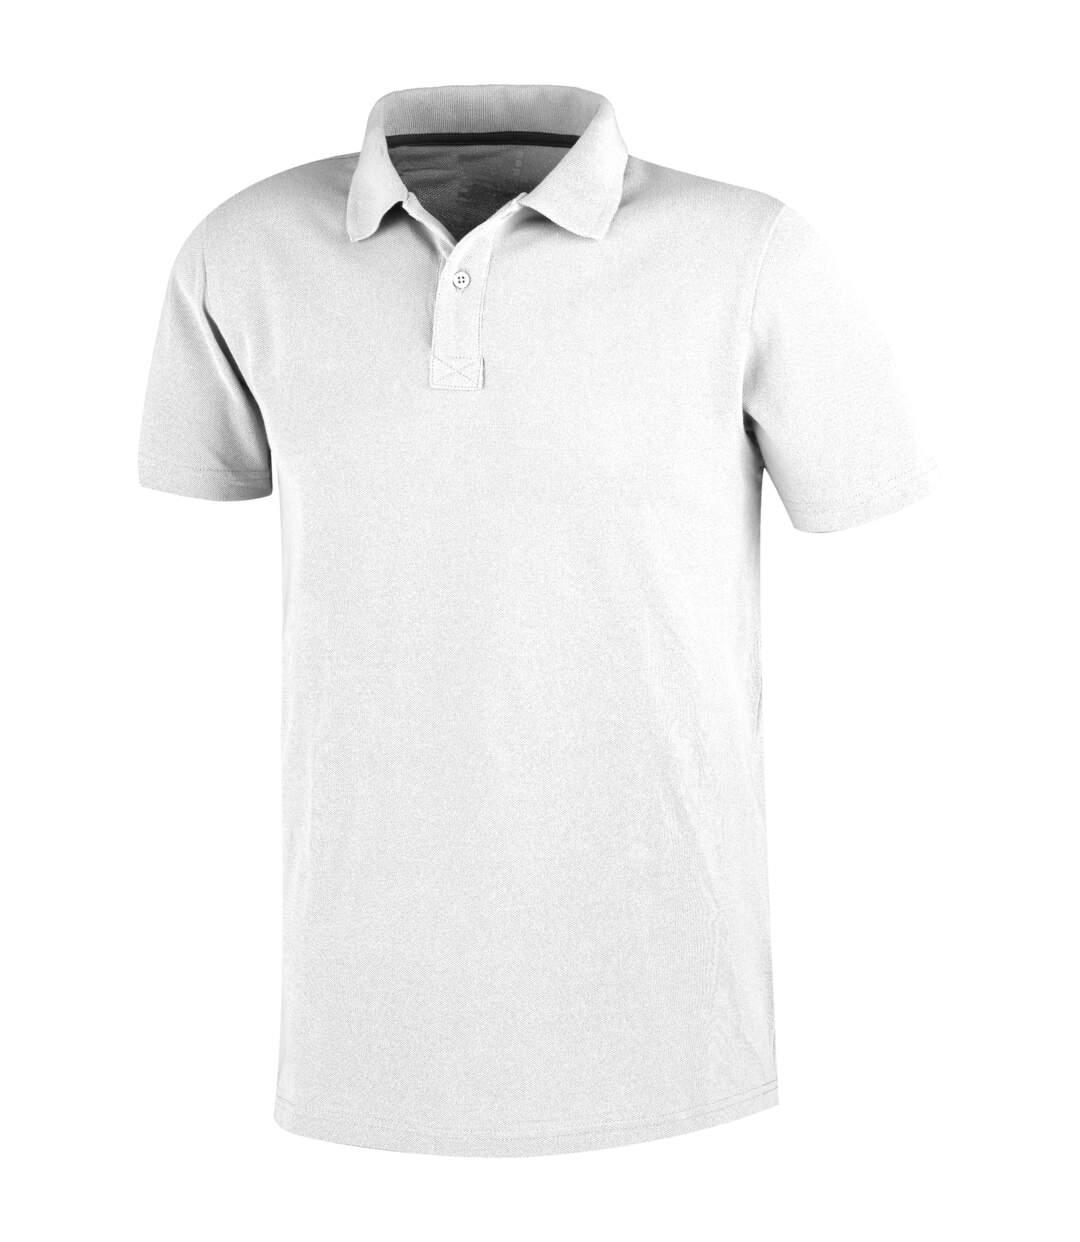 Elevate Primus Short Sleeve Polo (Pink) - UTPF1829